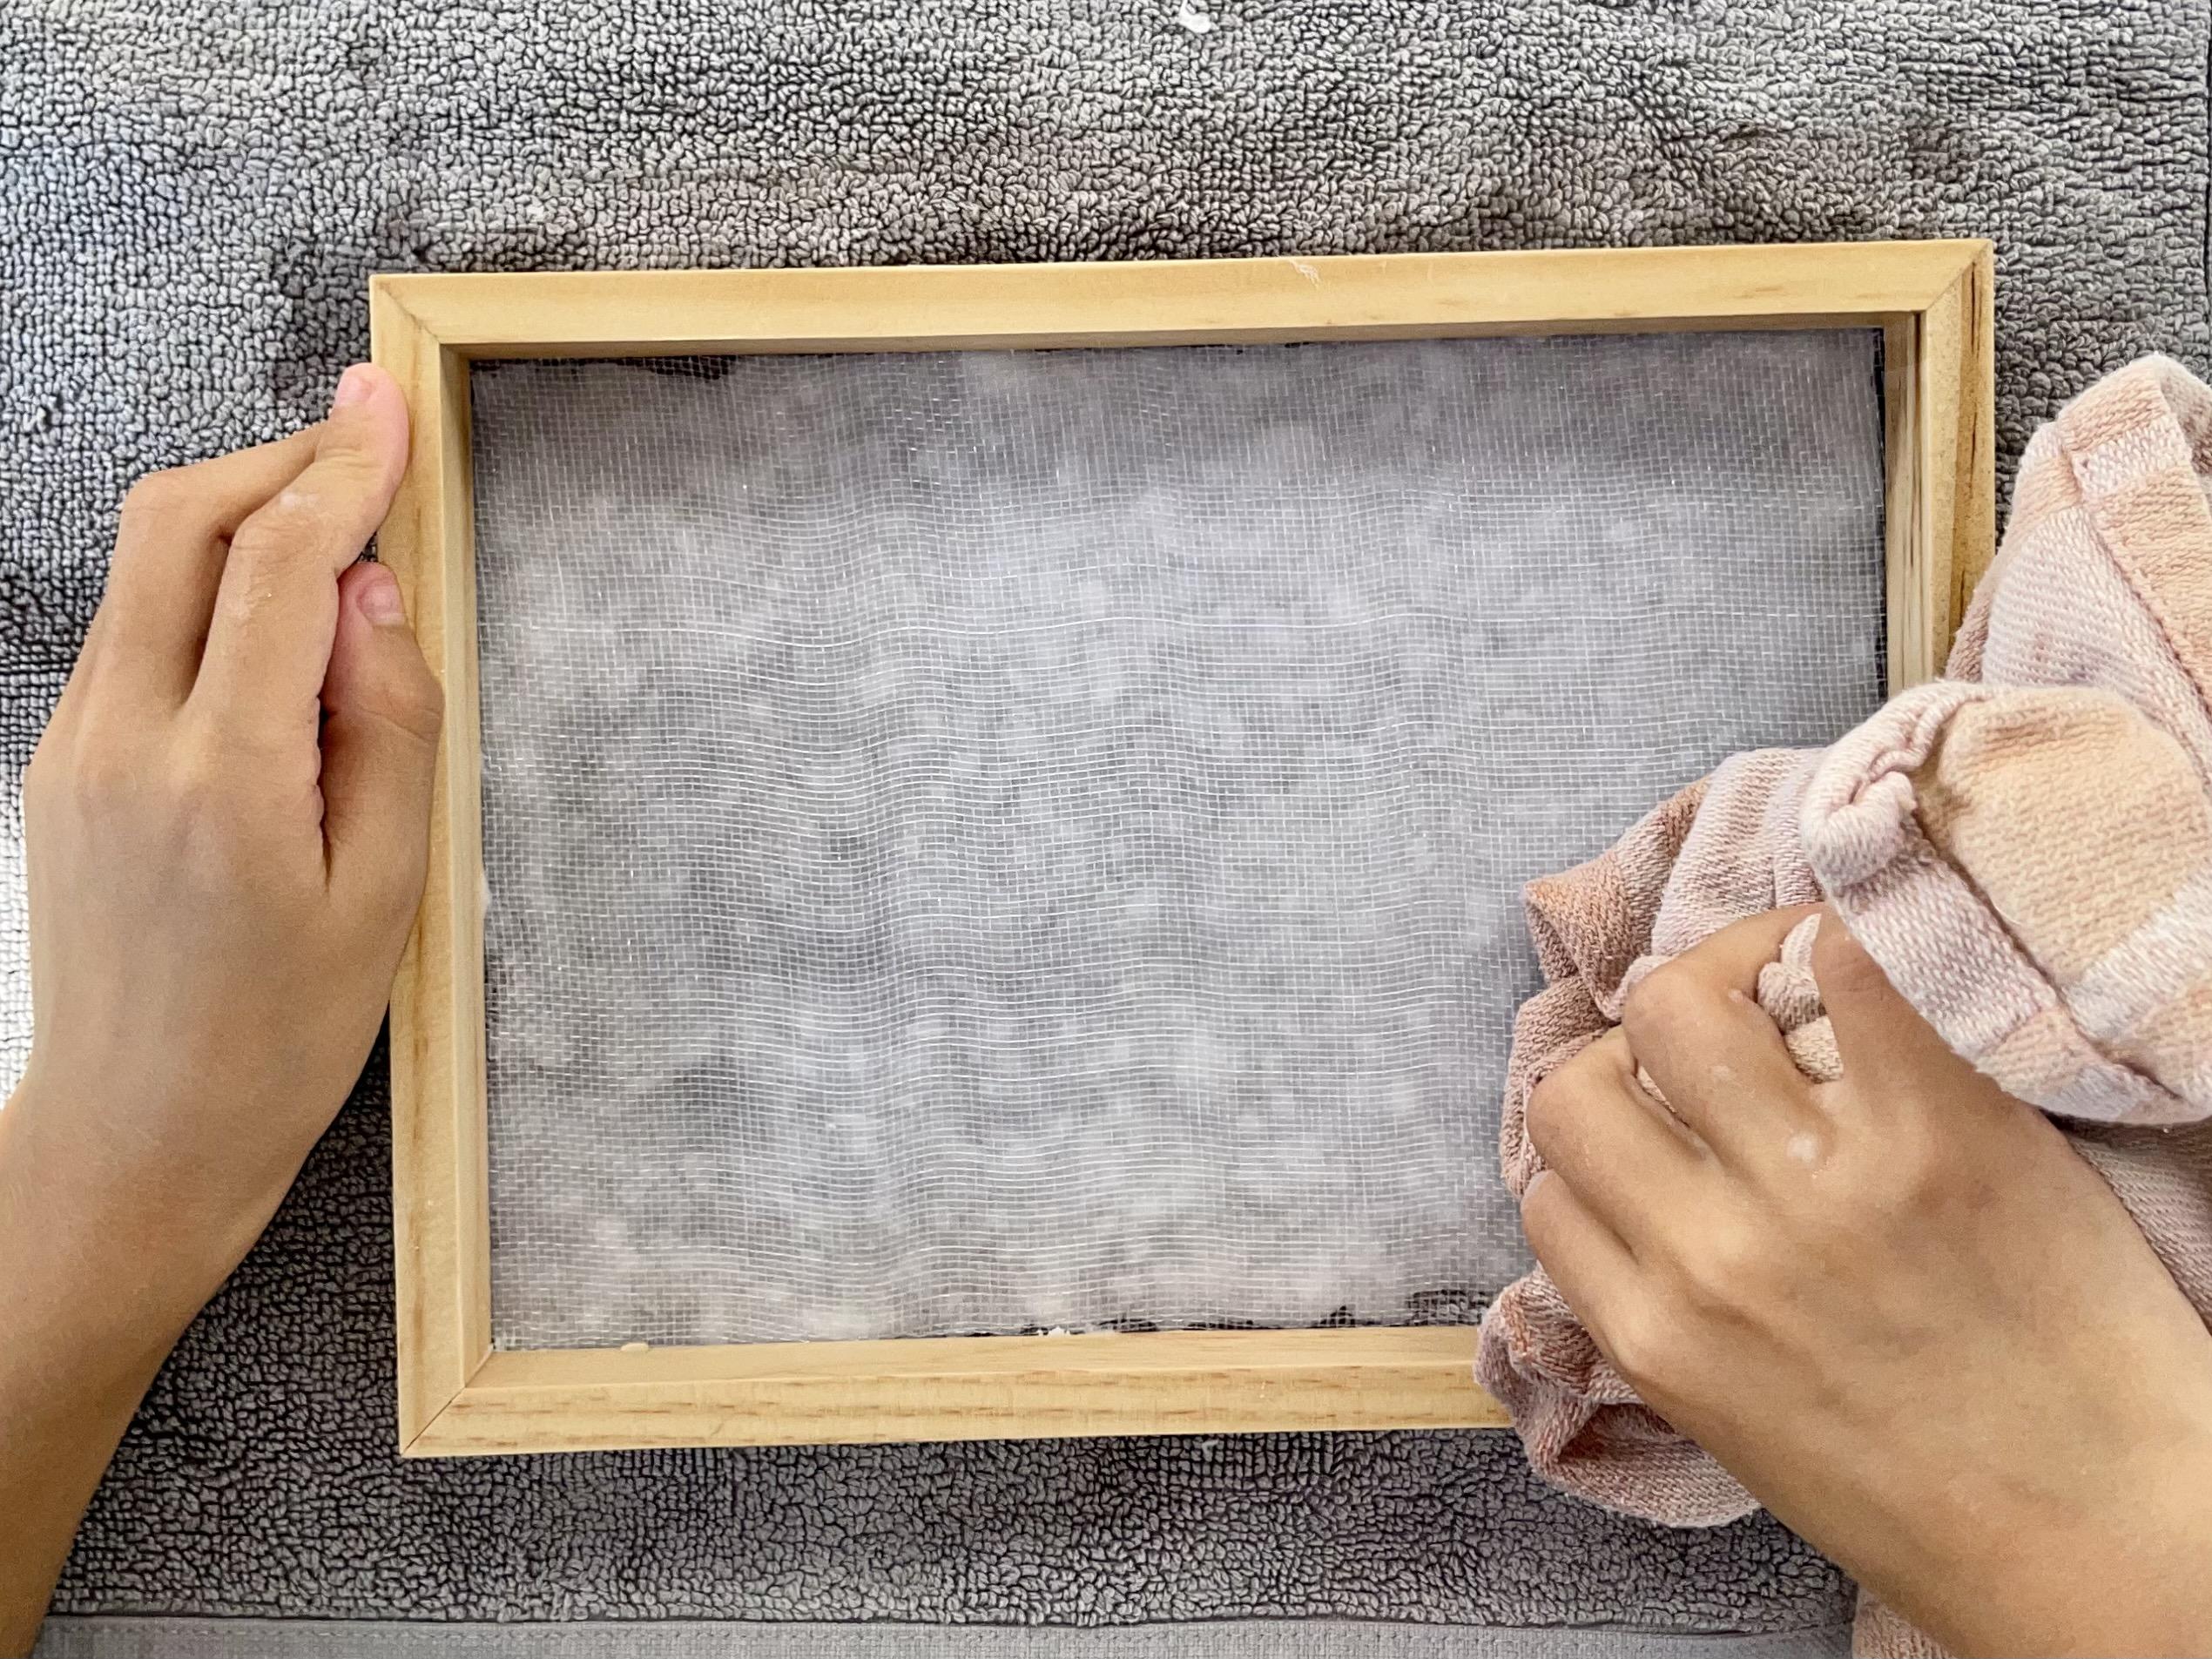 diy fabriquer du papier chiffon